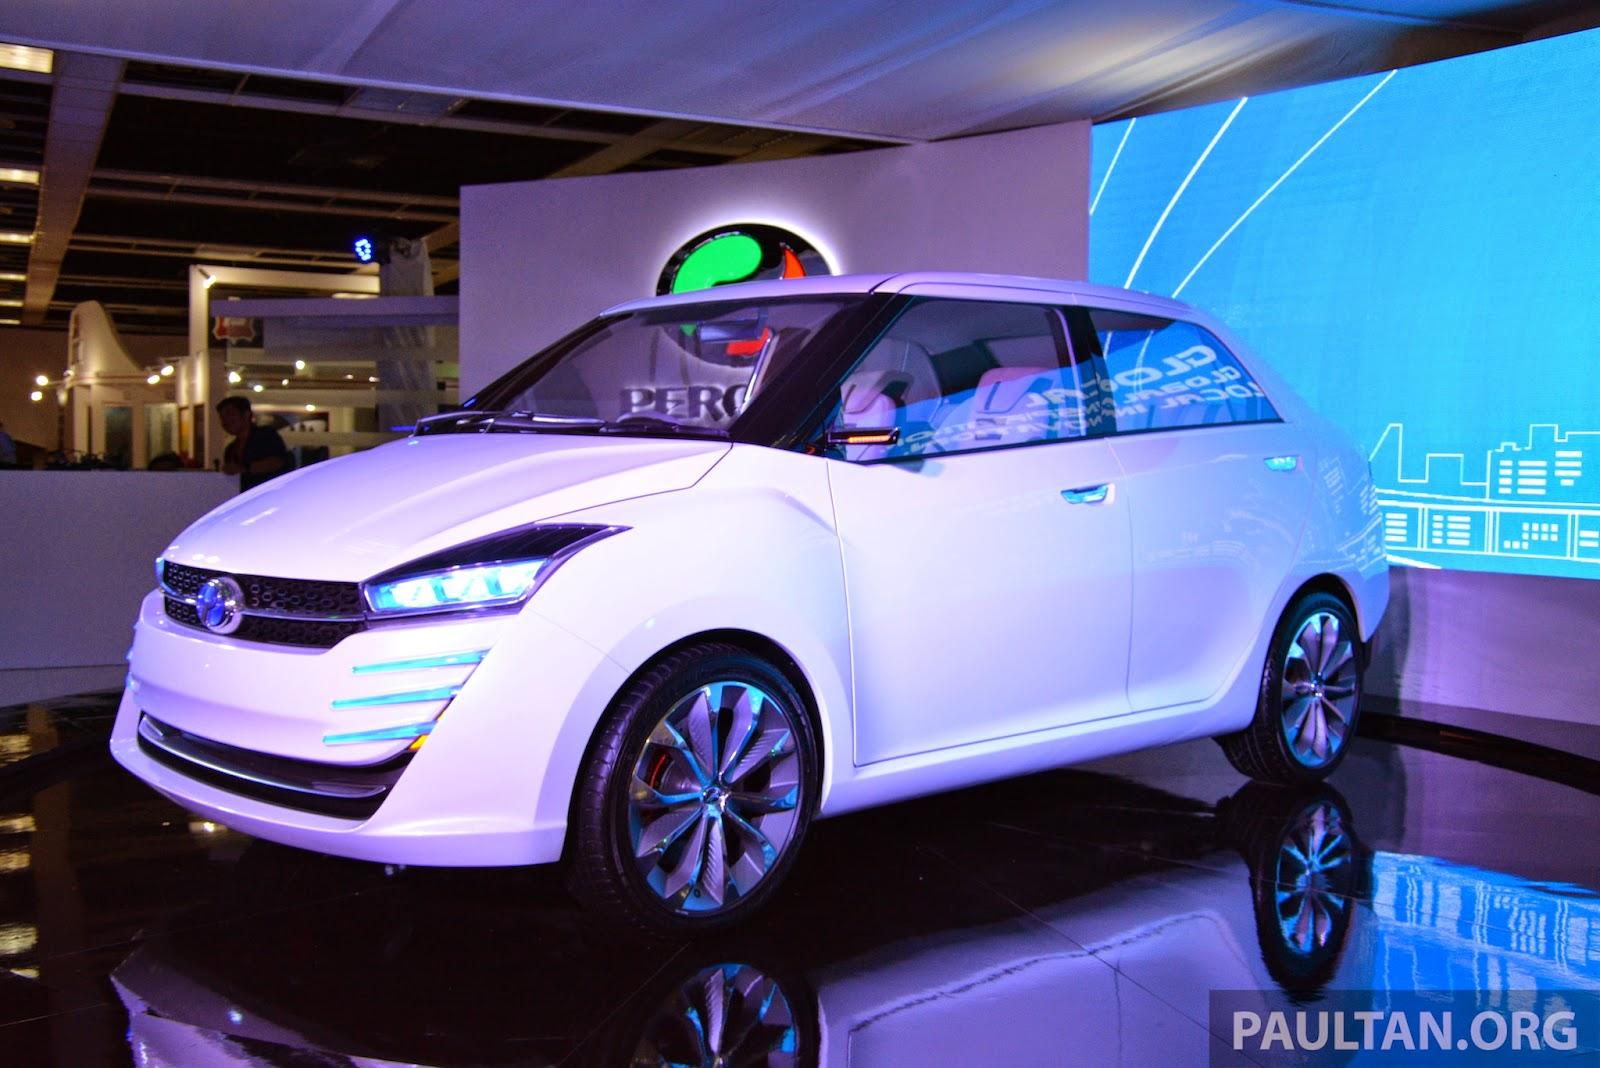 perodua new release carA Perodua Sedan in 2016maybe  AUTOMOLOGY automotive  logy the